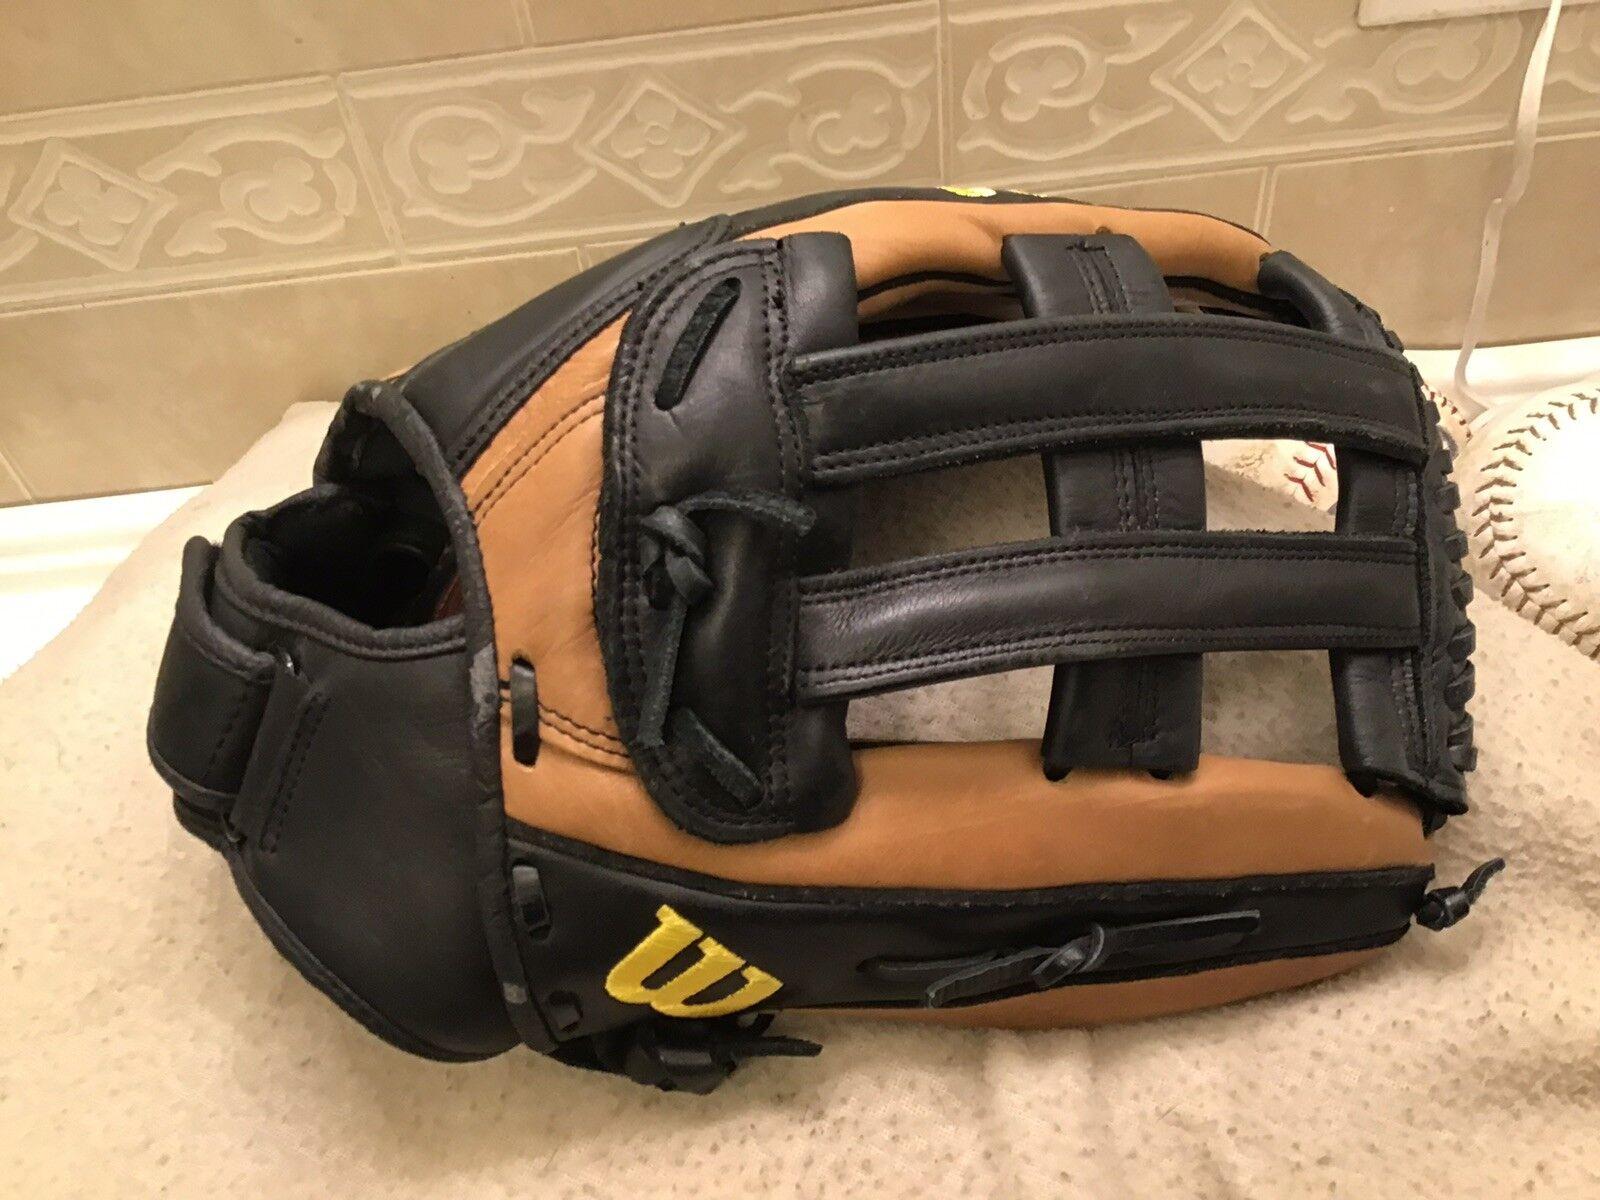 Wilson A800 Baseball SP14 14' Baseball A800 Softball Glove Right Hand Throw 0ad254